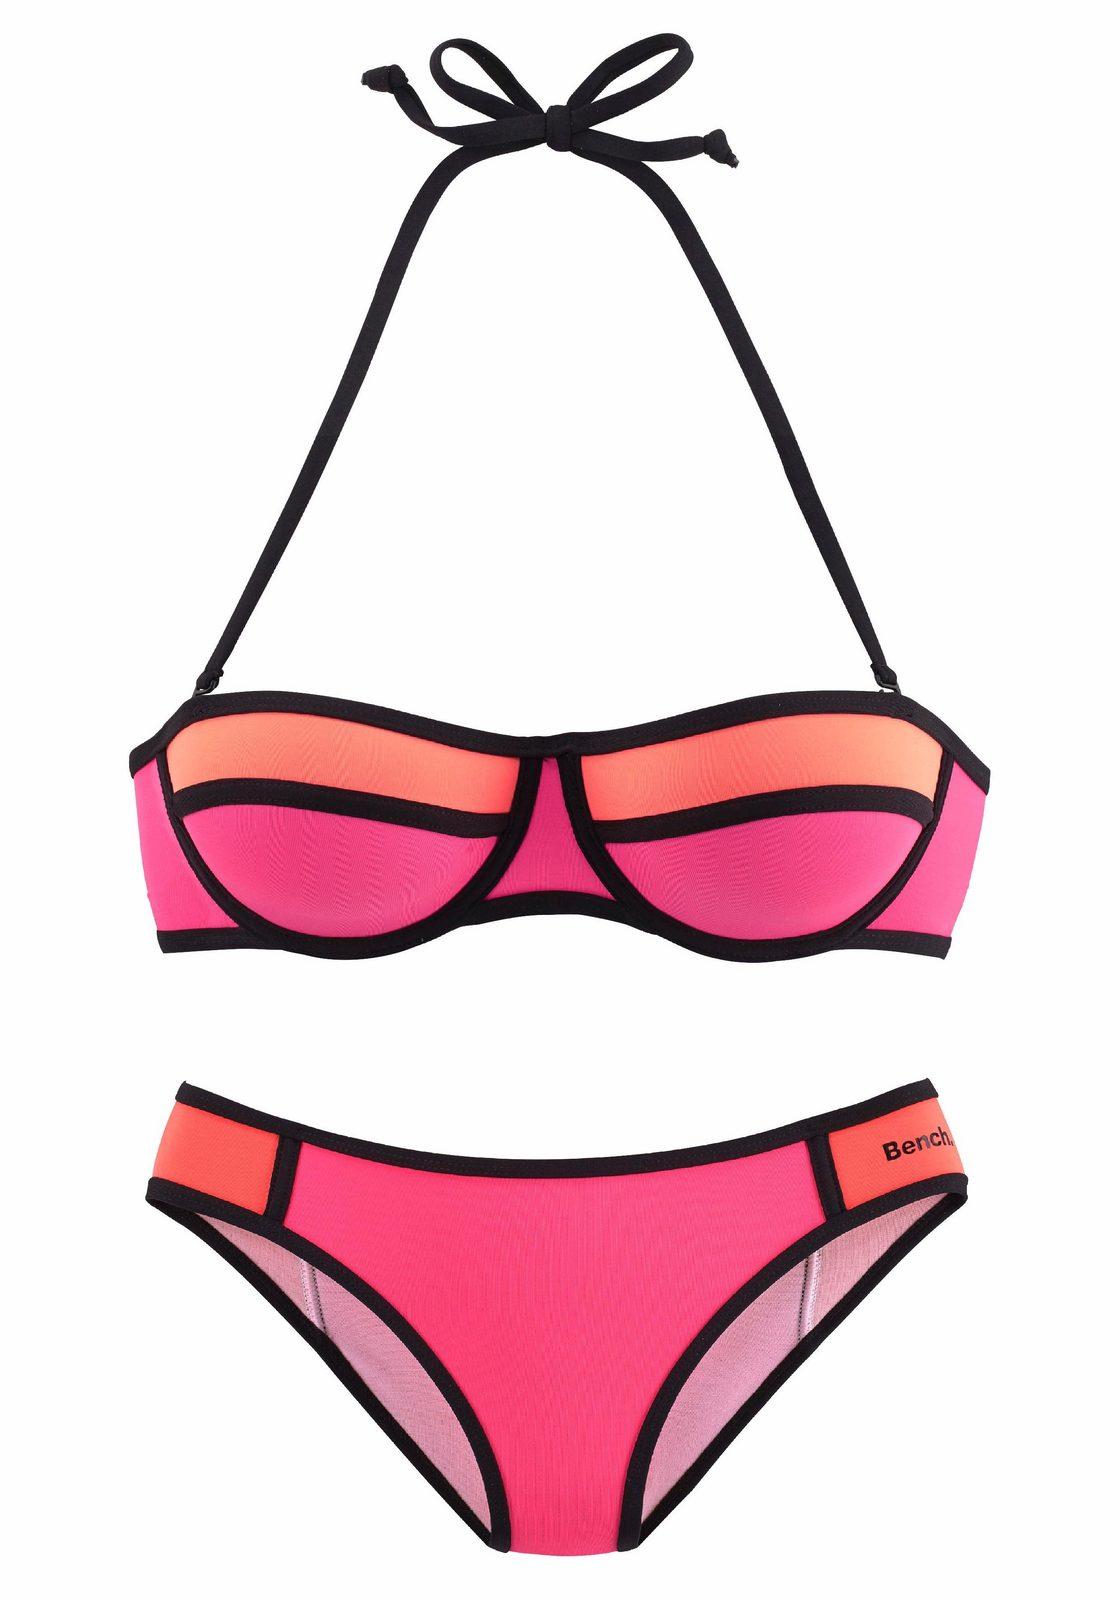 Bench. Balconette-Bikini mit Kontrastpaspel